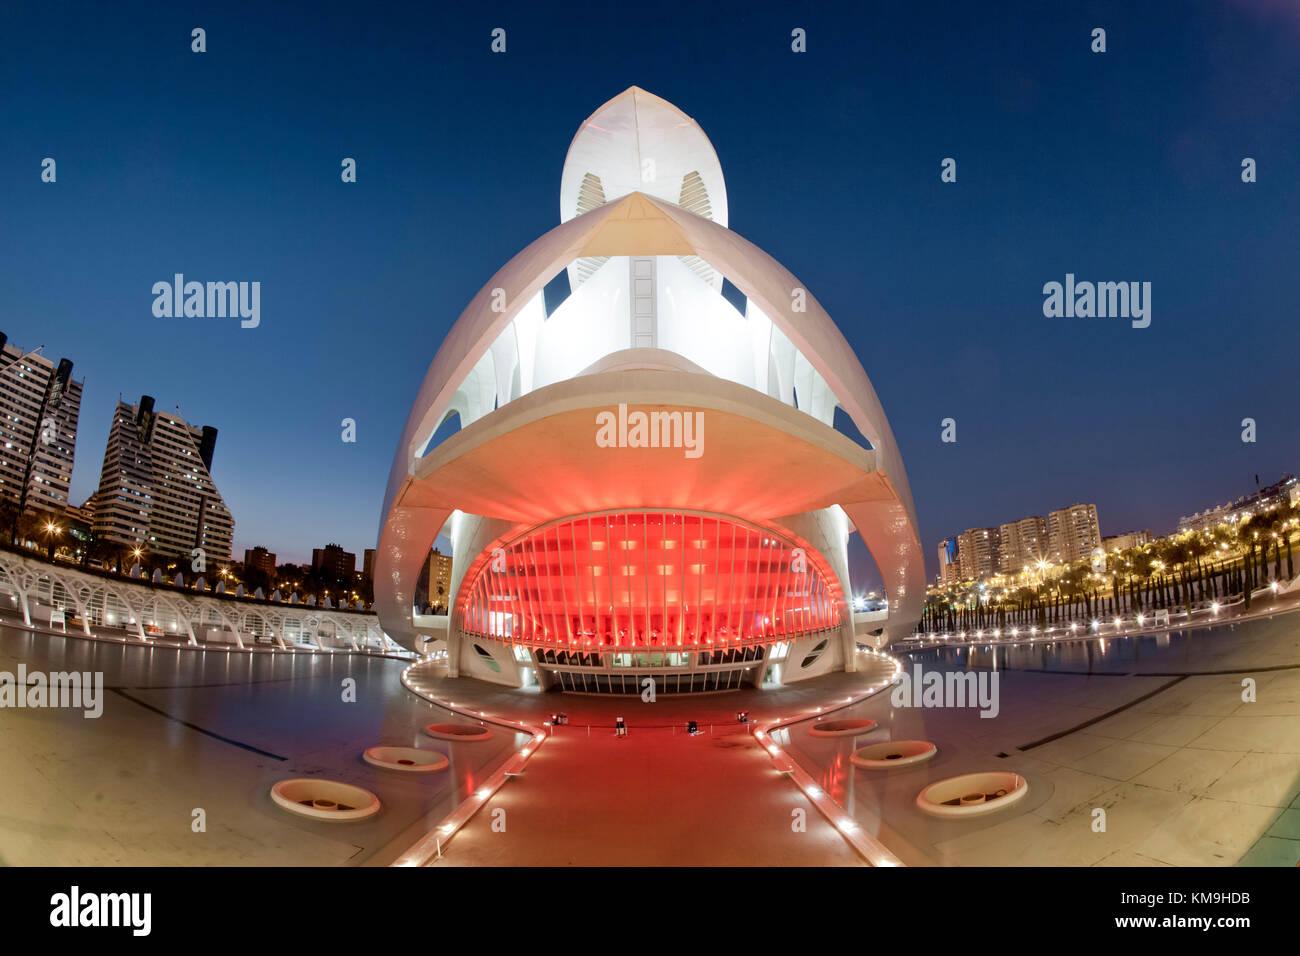 The Palau de les Arts Reina Sofia by Calatrava, , Valencia, Spain Stock Photo